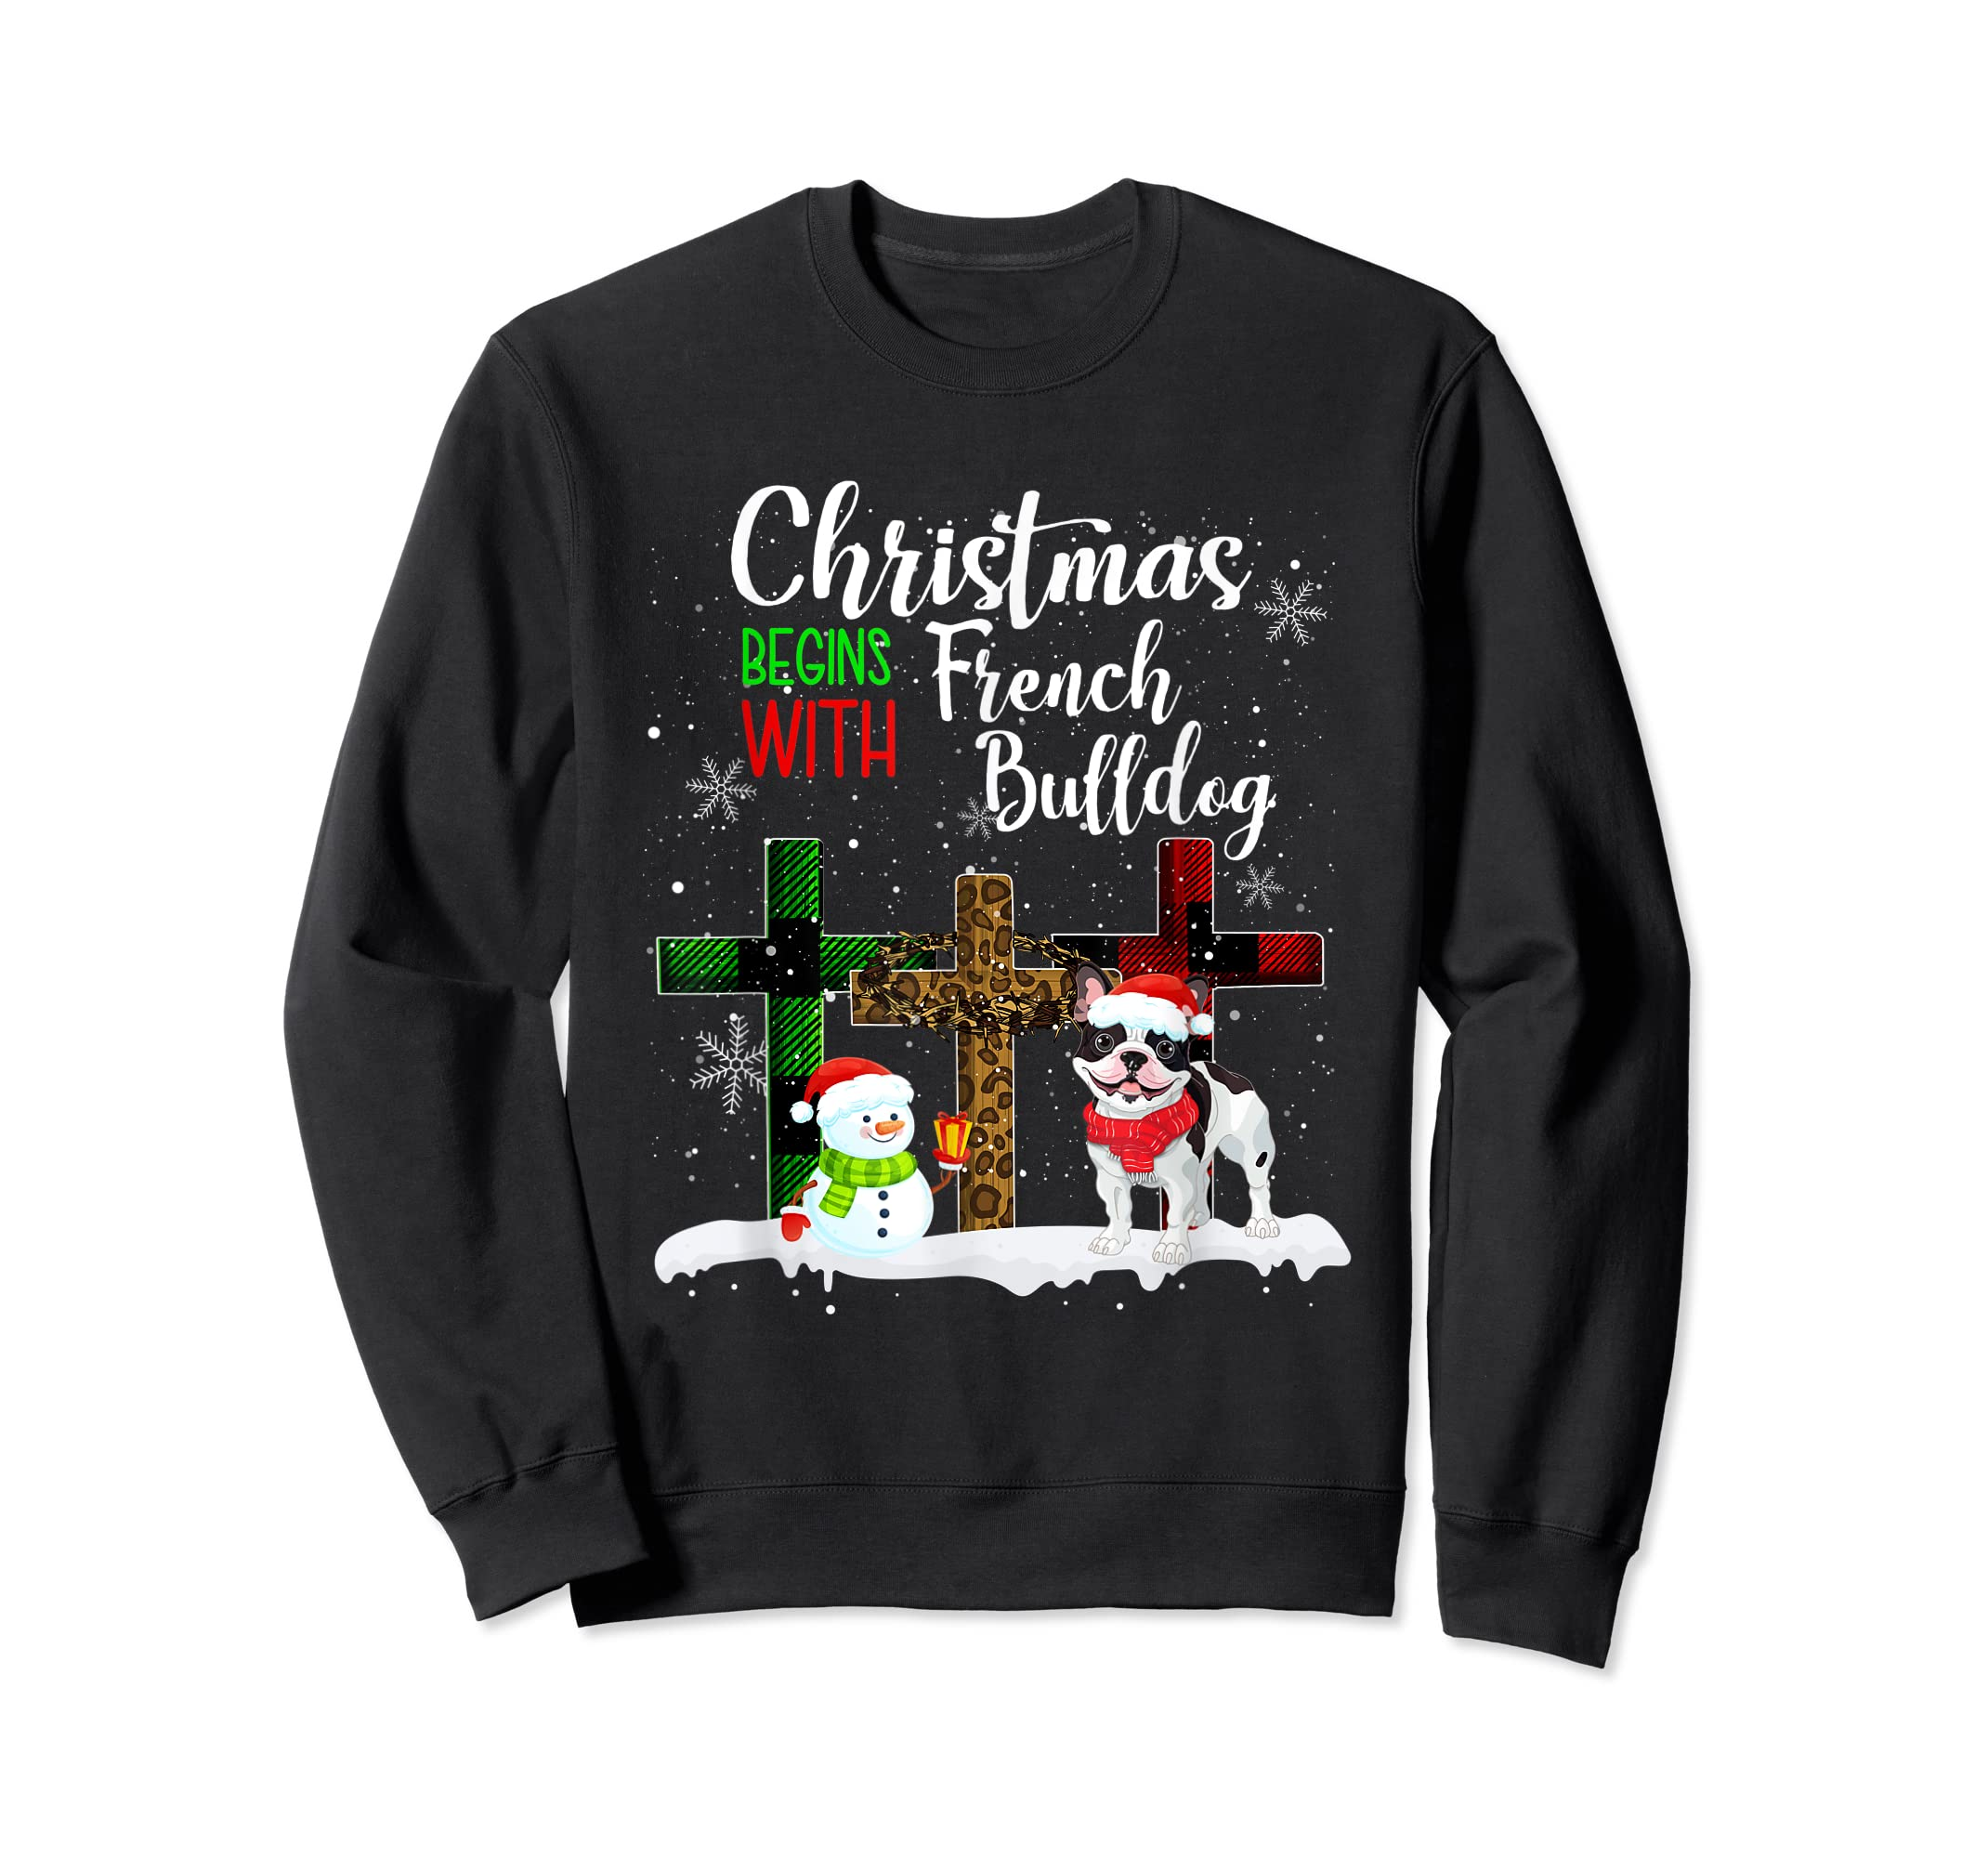 Christmas Begins With French Bulldog Costume Xmas Gifts T-Shirt-Sweatshirt-Black